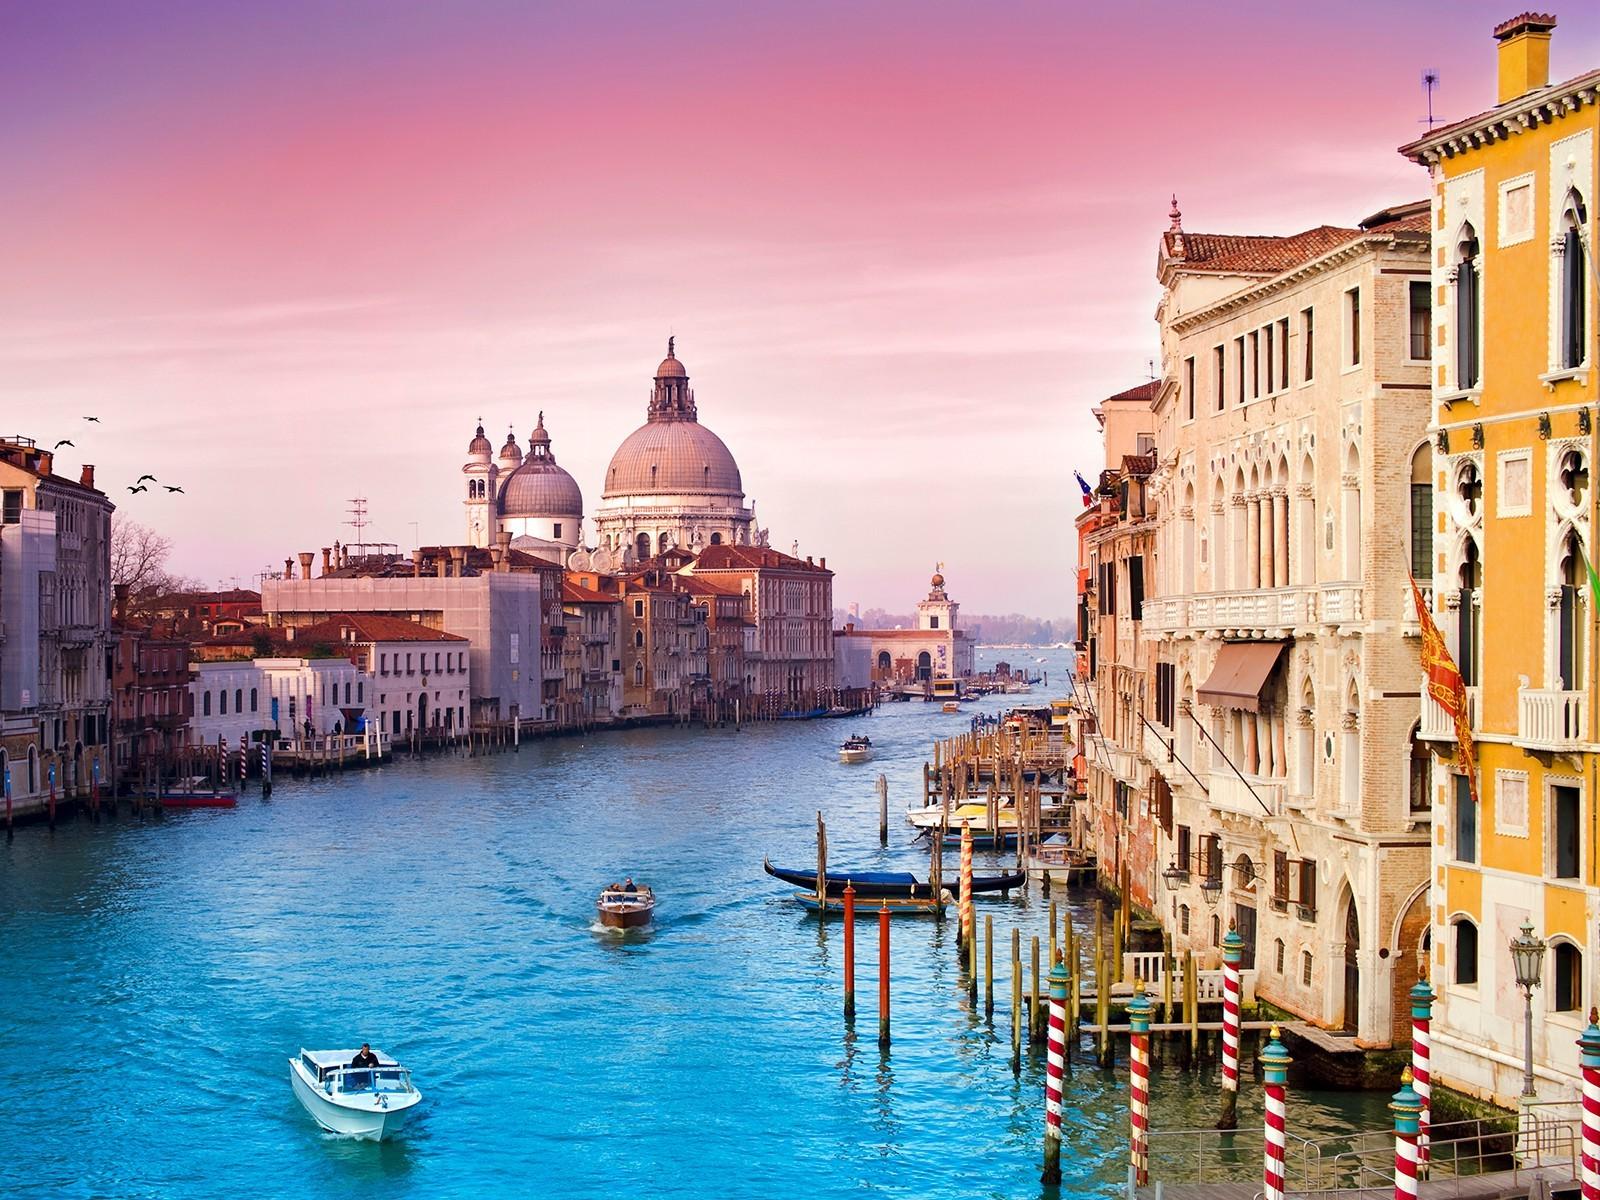 Обои кафе, канал, венеция. Города foto 17